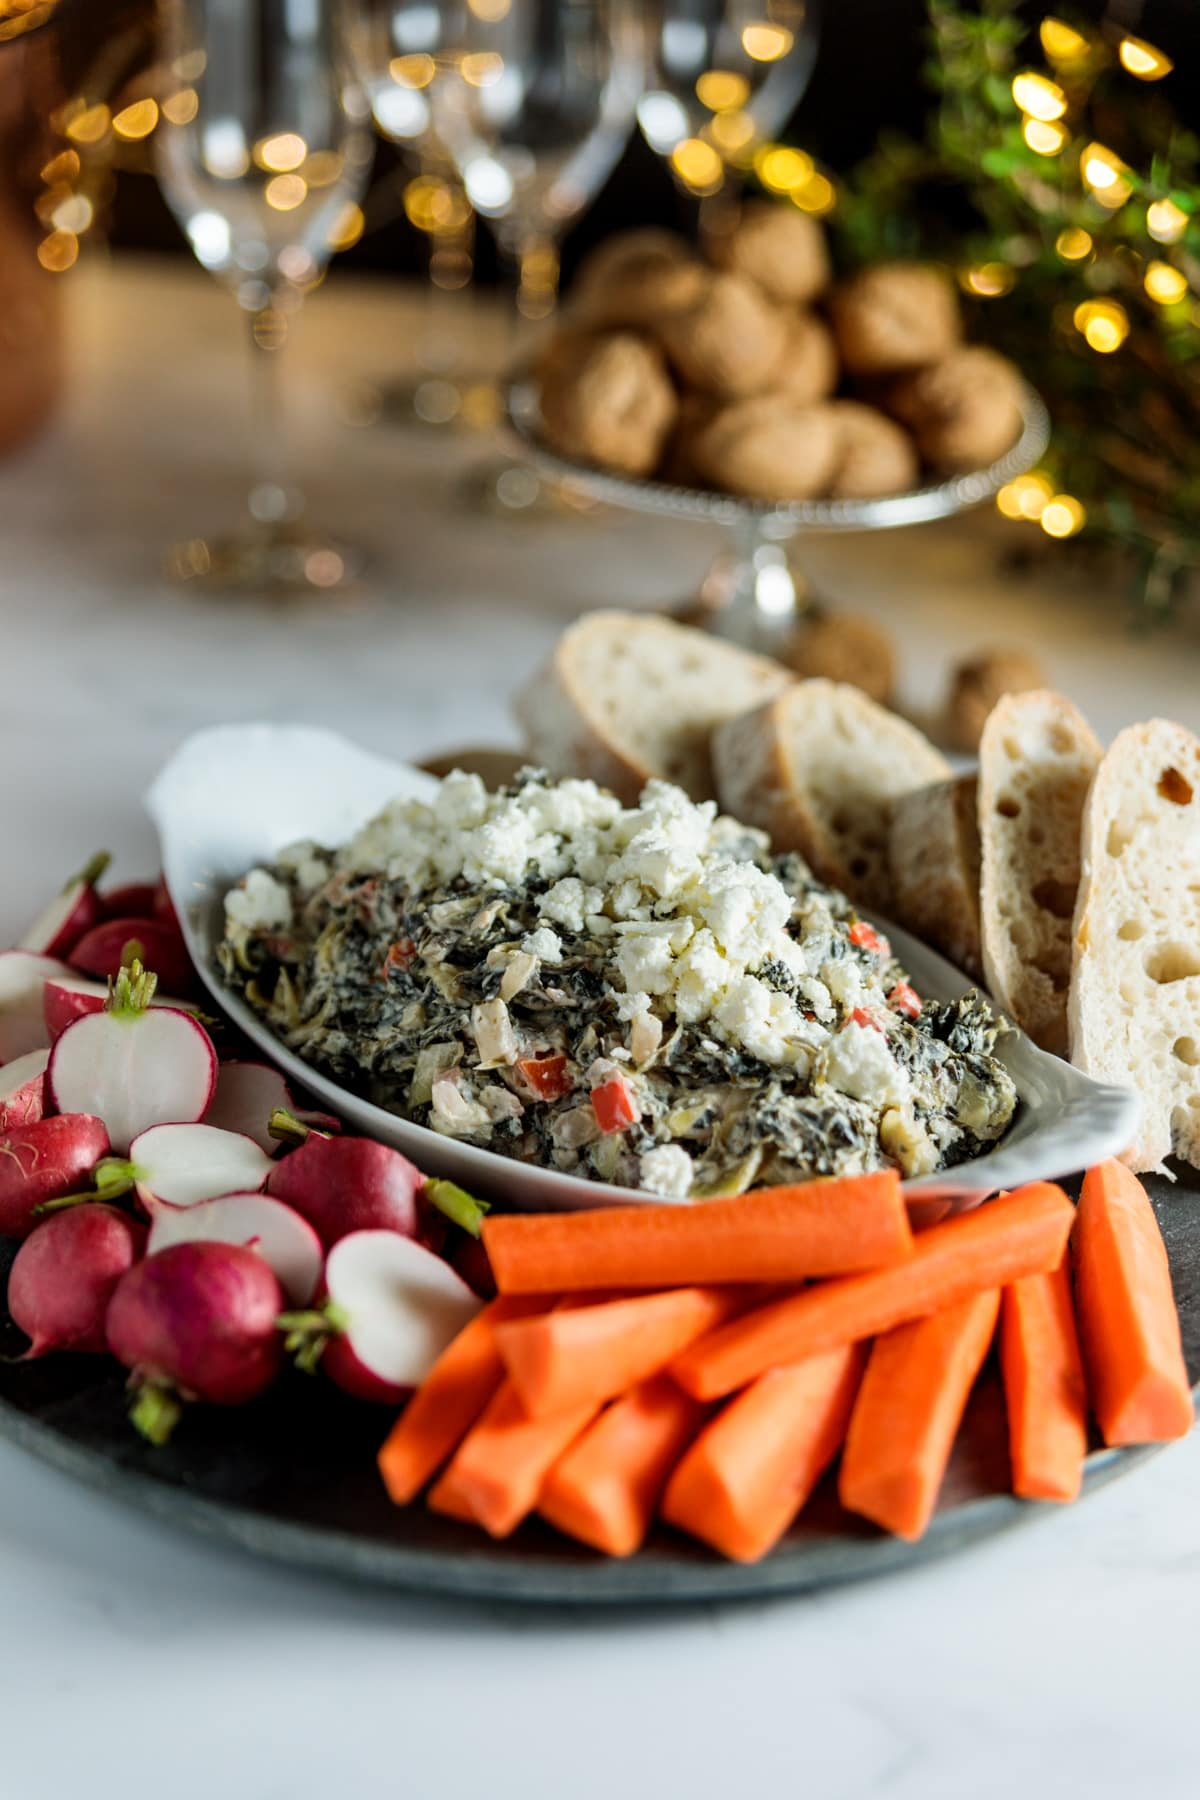 Spinach + Artichoke Dip | Wyse Guide